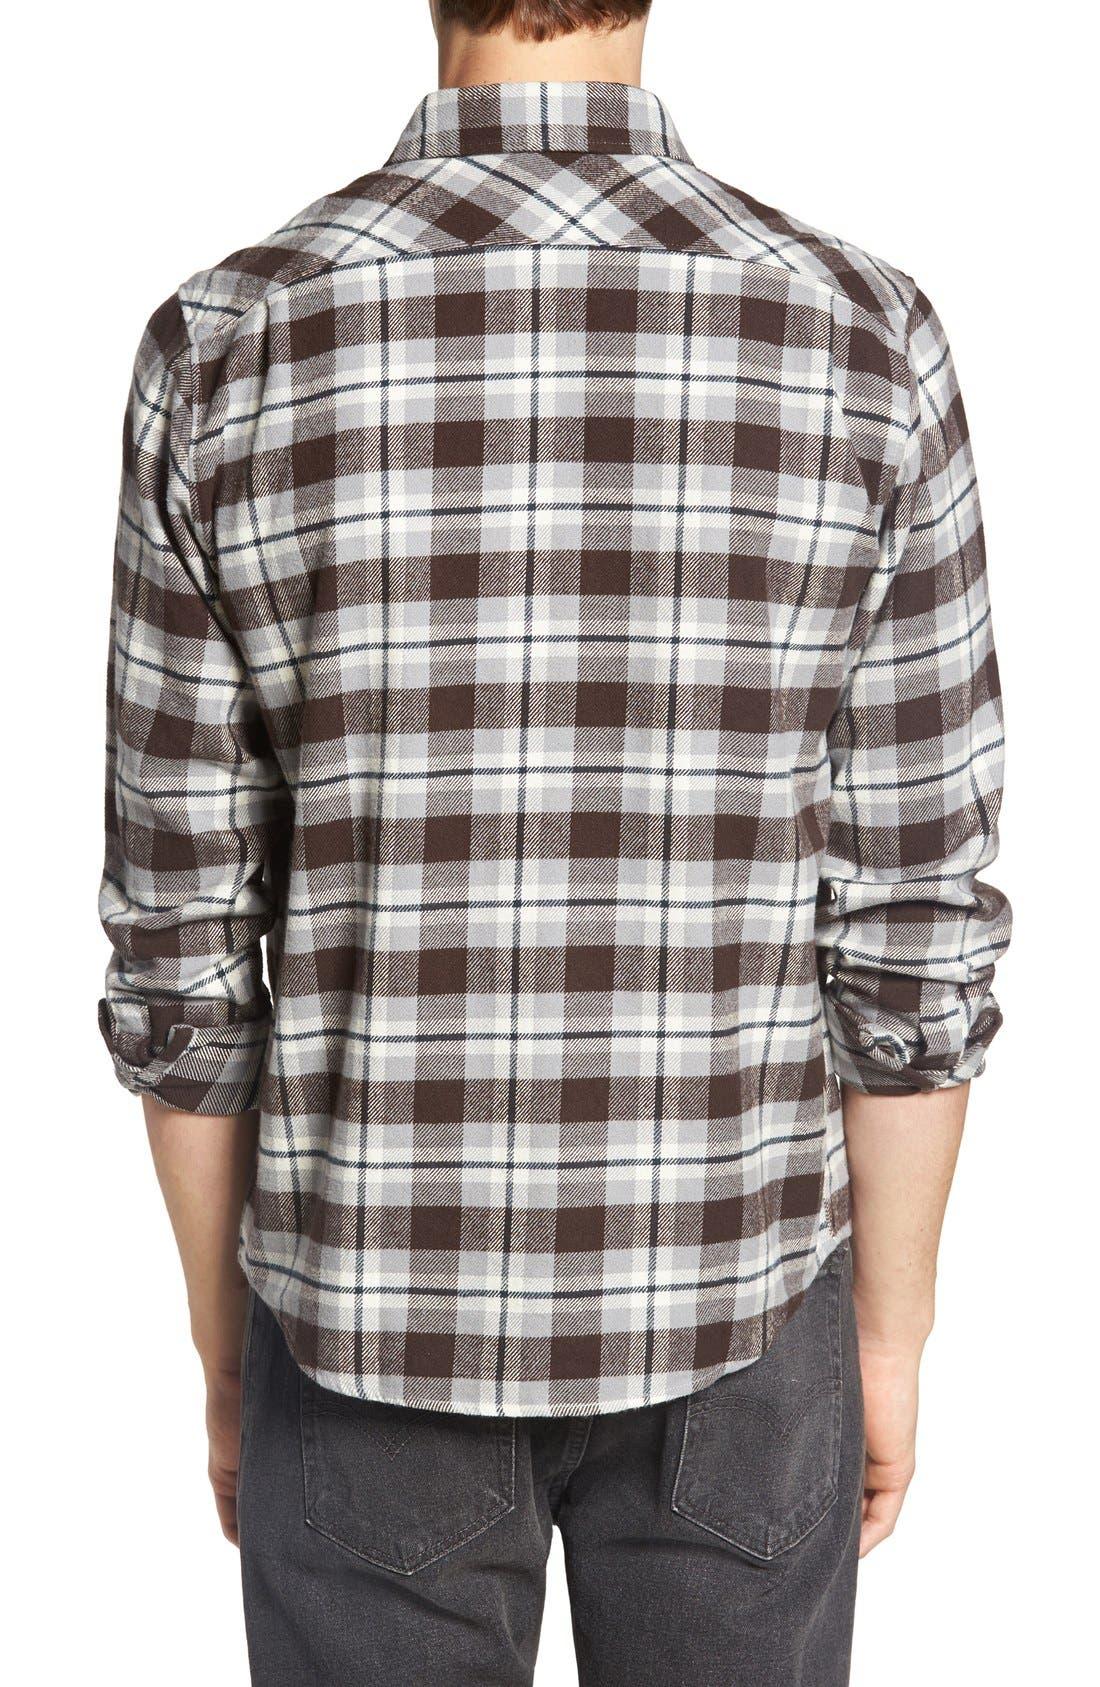 'That'll Work' Trim Fit Plaid Flannel Shirt,                             Alternate thumbnail 35, color,